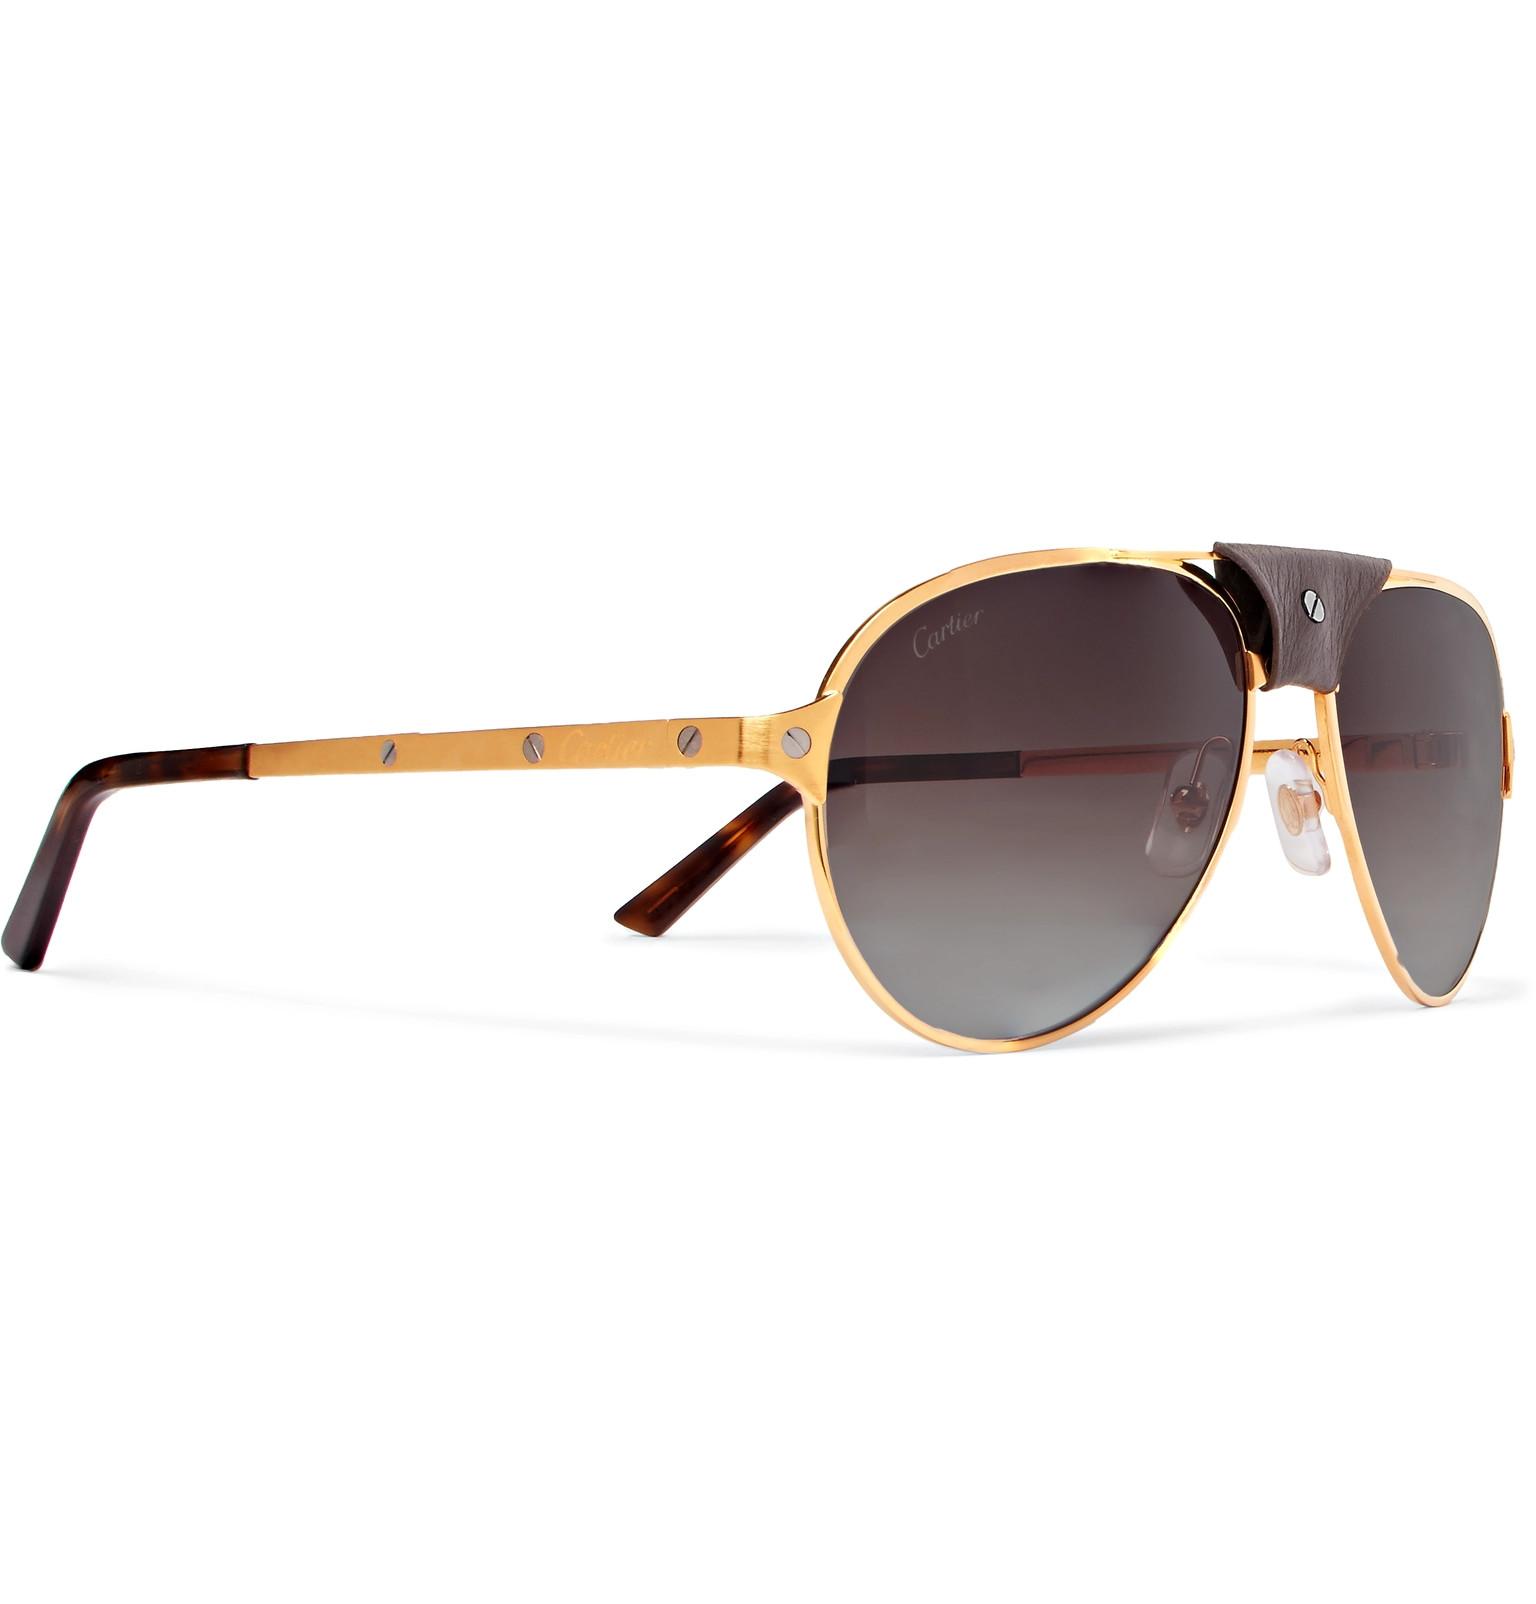 f552cb4a1885 Cartier EyewearSantos de Cartier Aviator-Style Leather-Trimmed Gold-Plated  Sunglasses